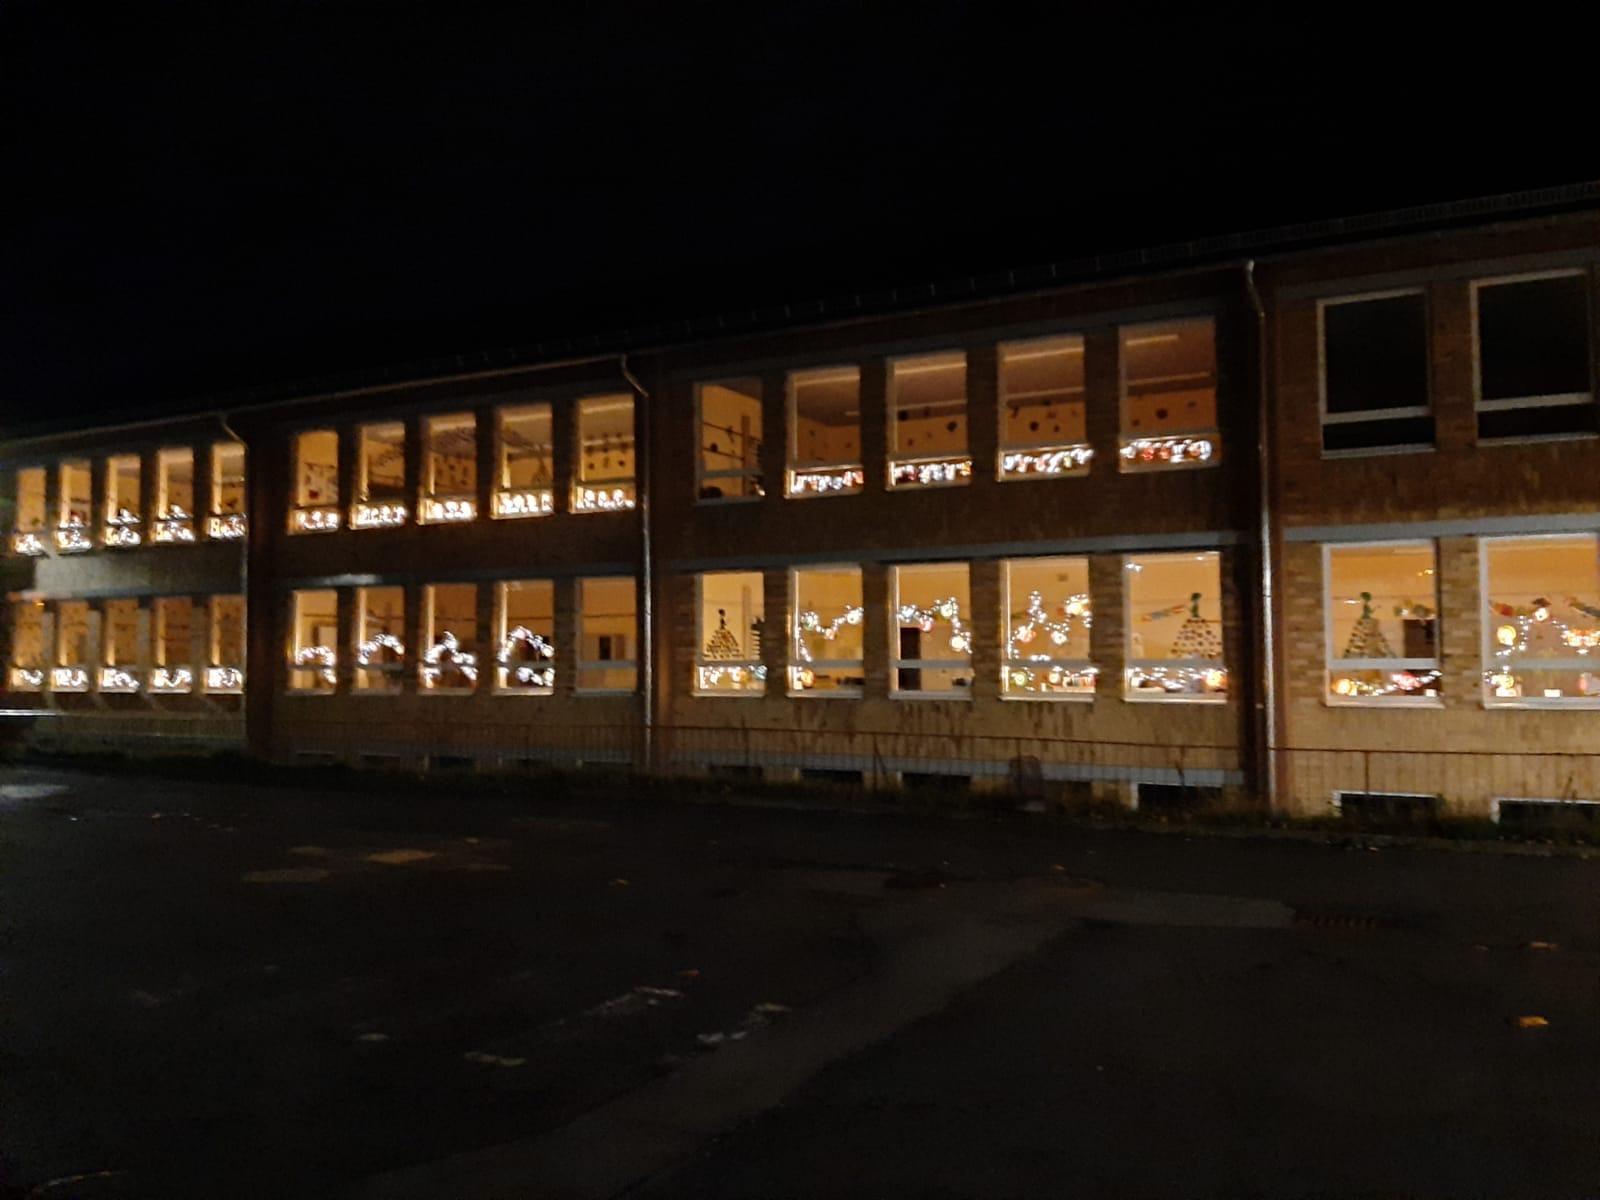 Aktion Laternenfenster